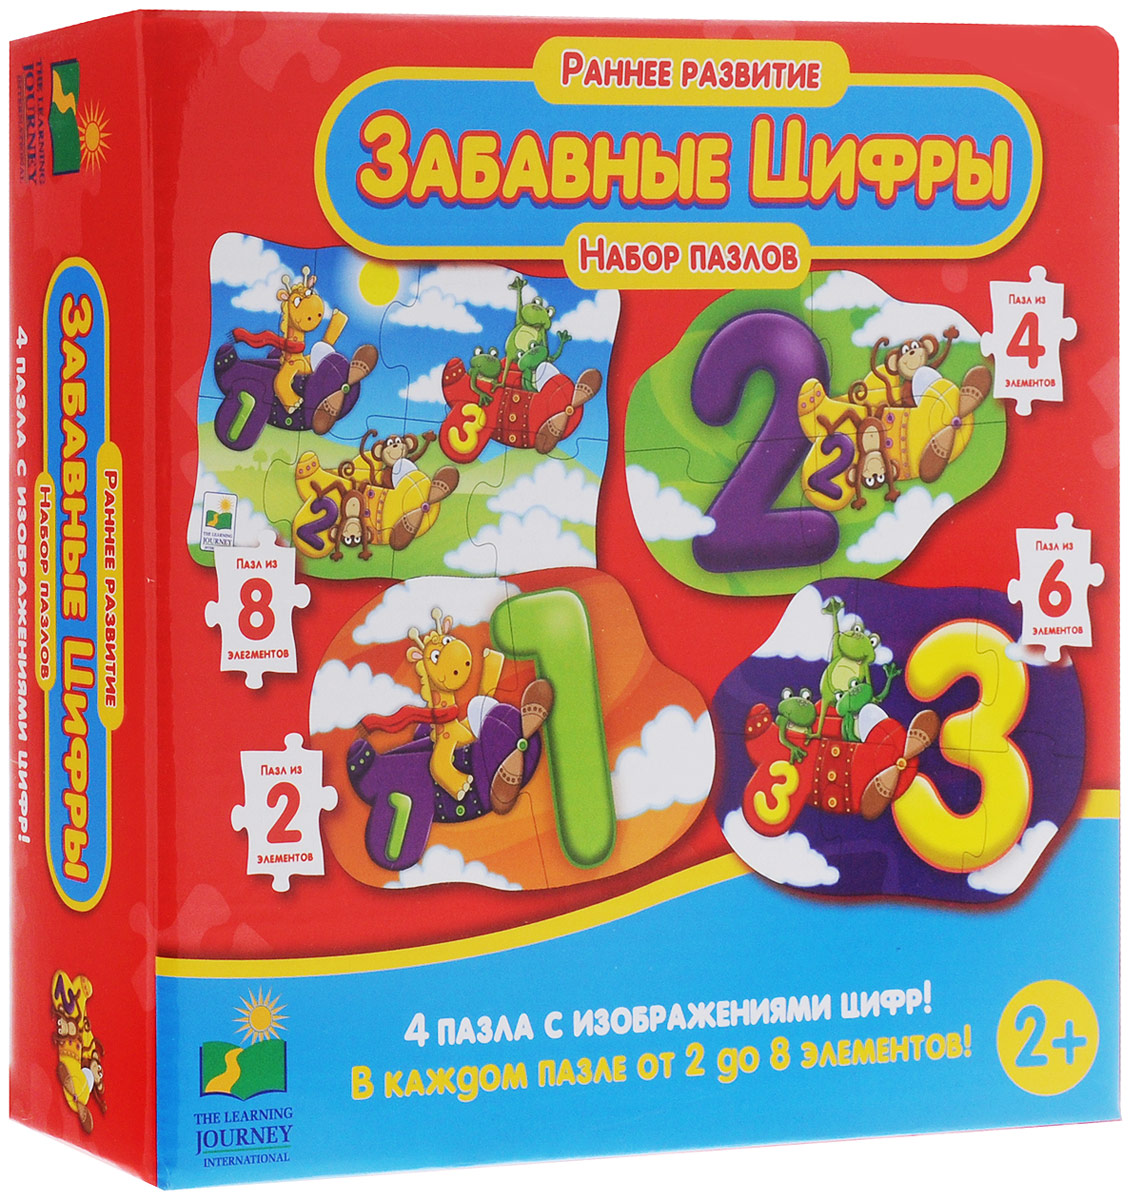 Learning Journey Пазл для малышей Забавные цифры 4 в 1